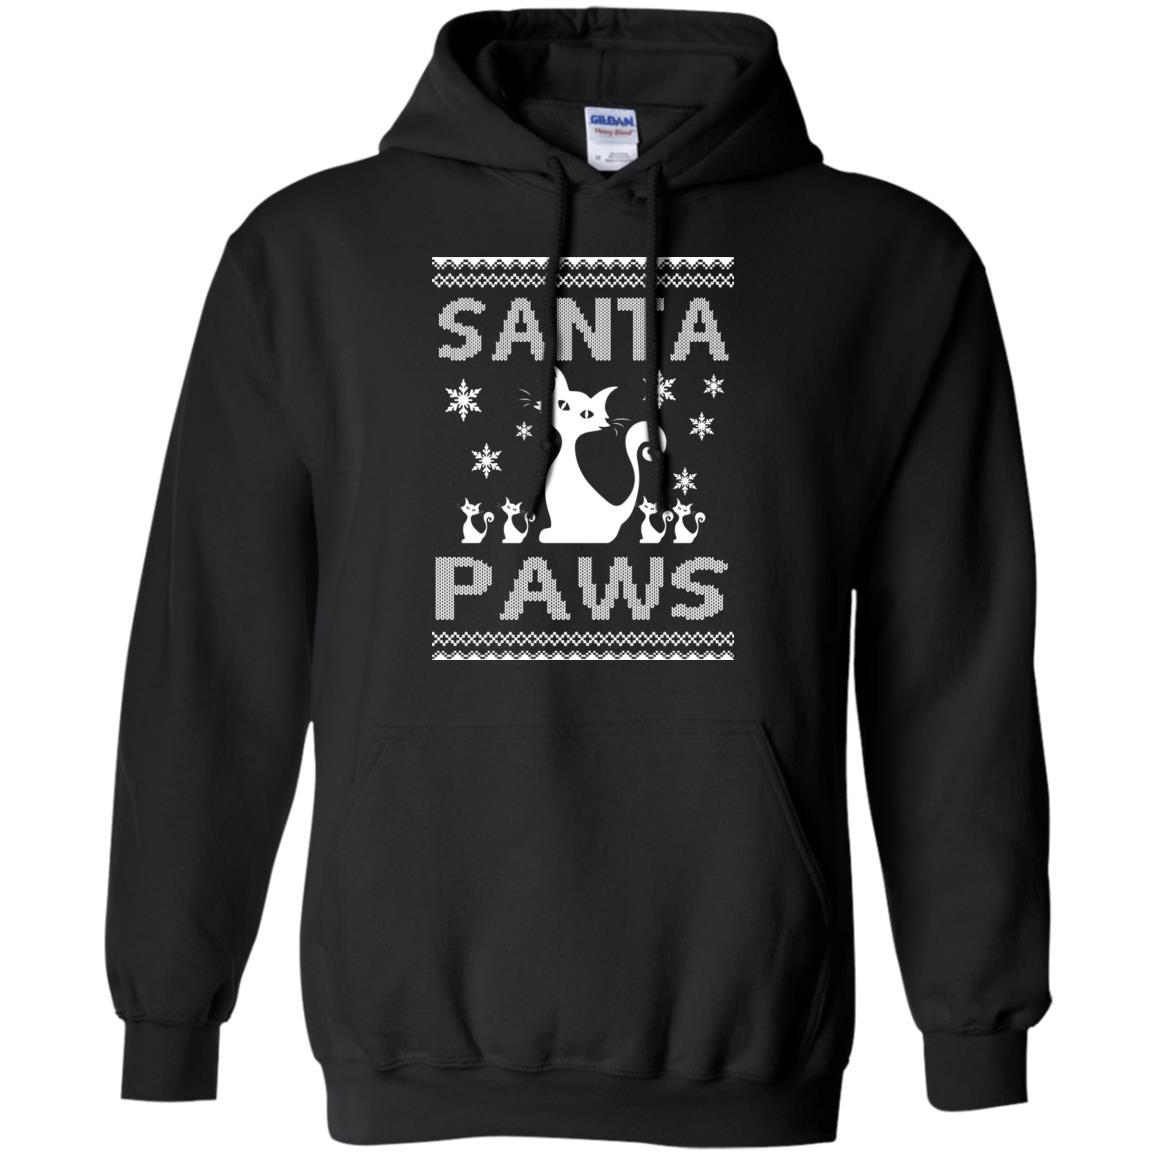 image 1675 - Santa Paws Cat Kitten Ugly Sweater, Christmas Sweatshirt